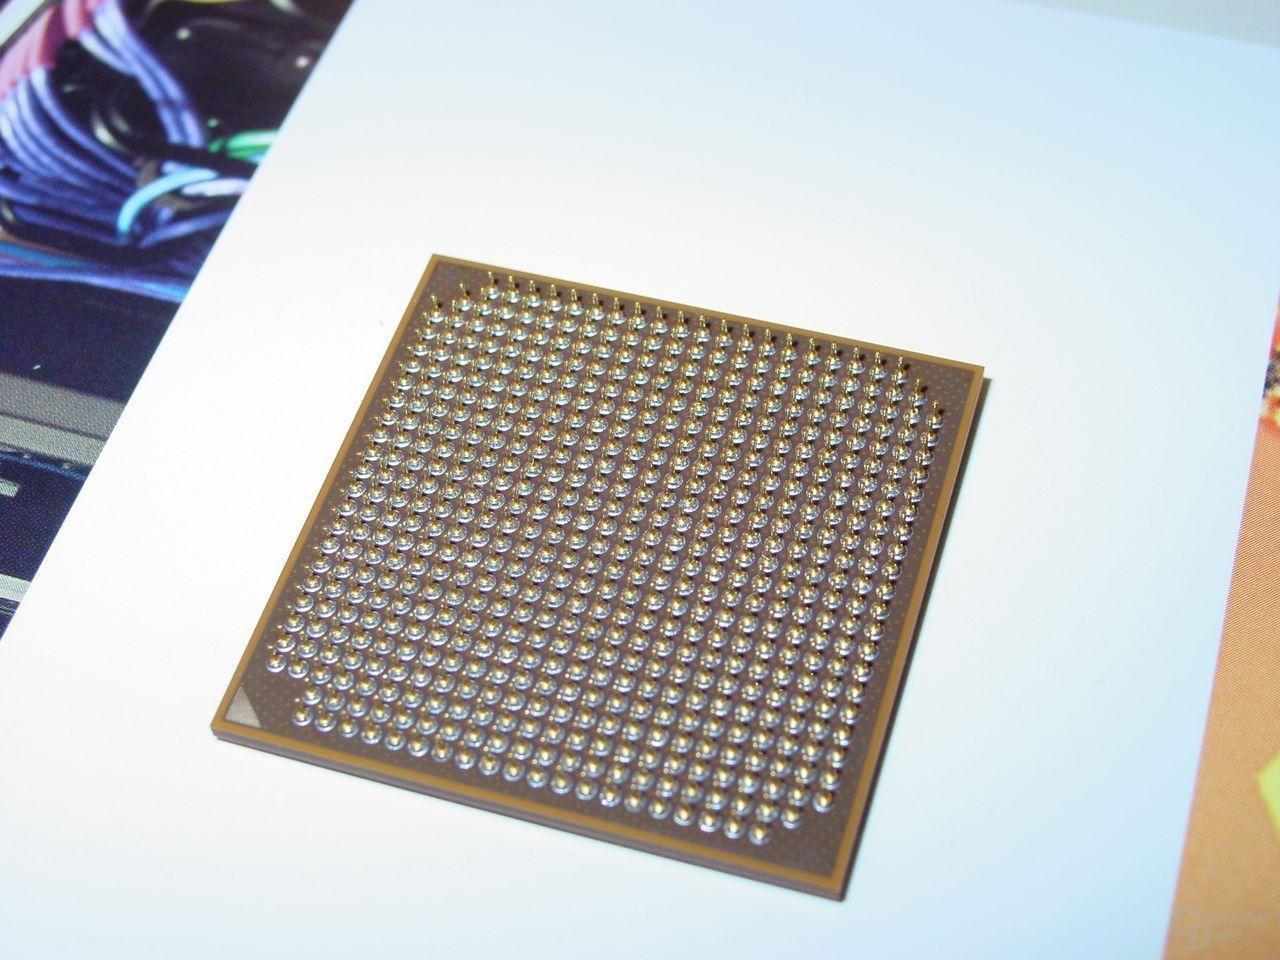 Low-Voltage Mobile AMD Athlon XP-M